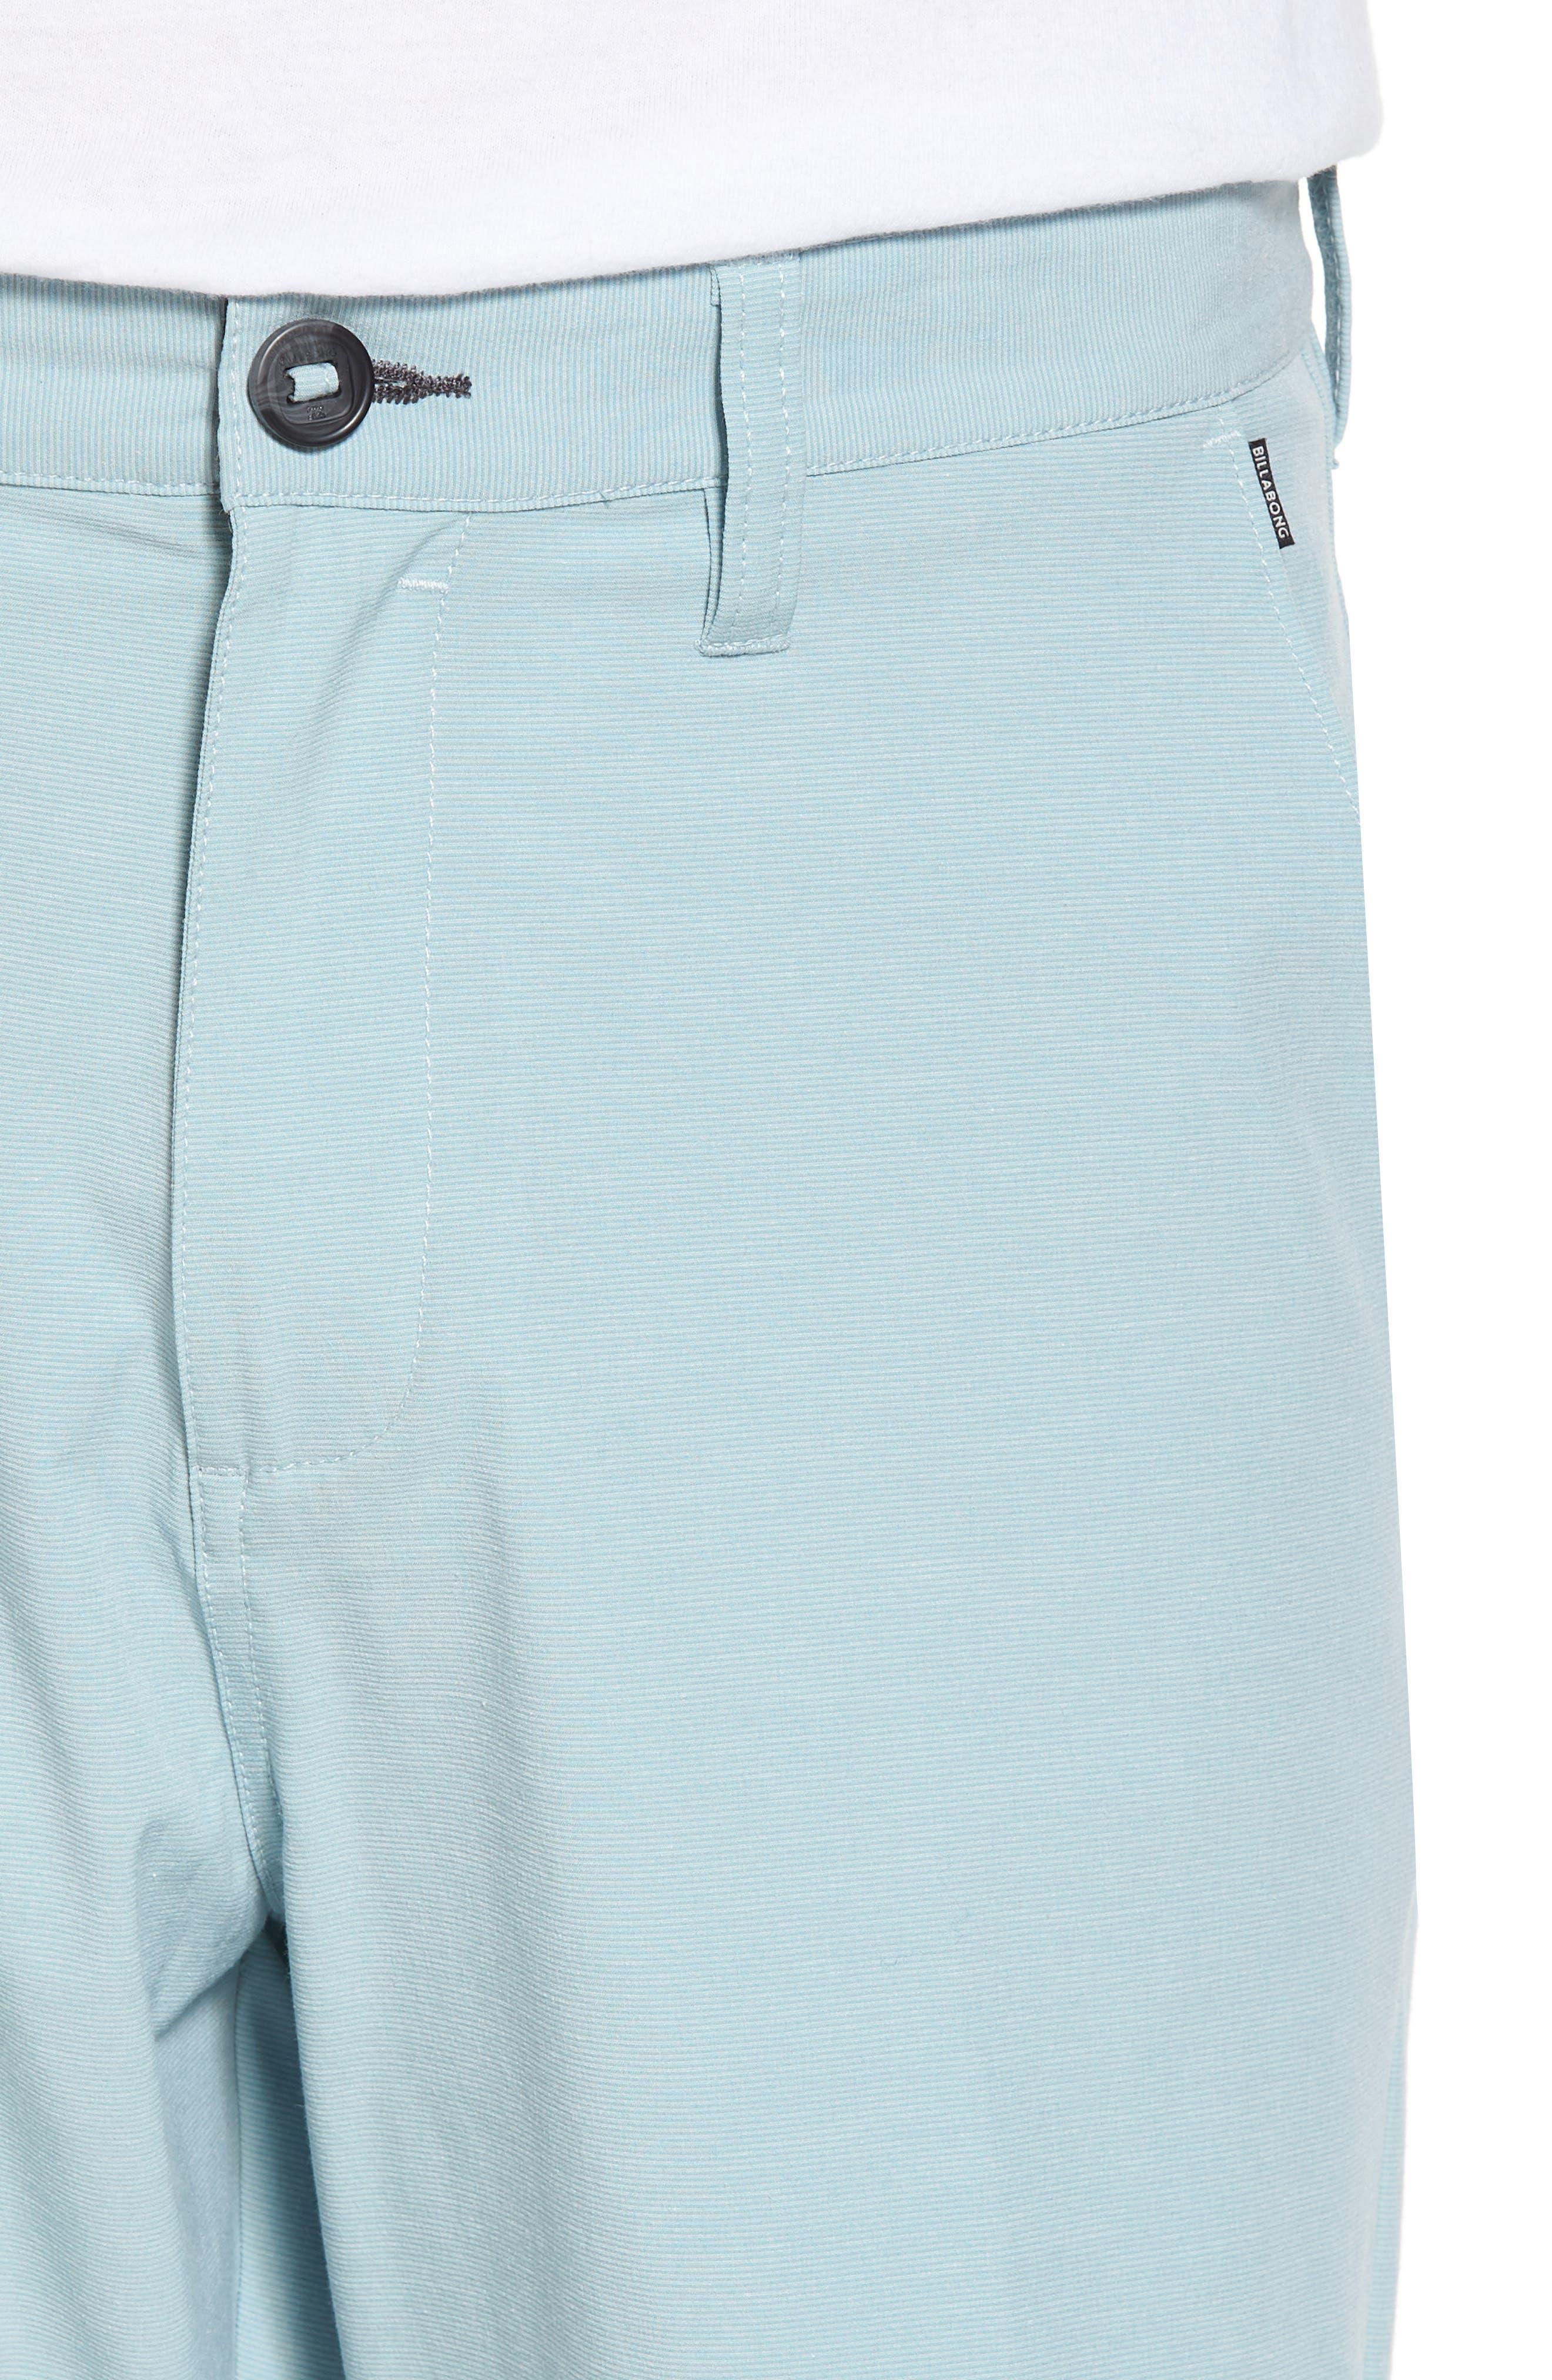 Crossfire X Hybrid Shorts,                             Alternate thumbnail 4, color,                             Dusty Blue